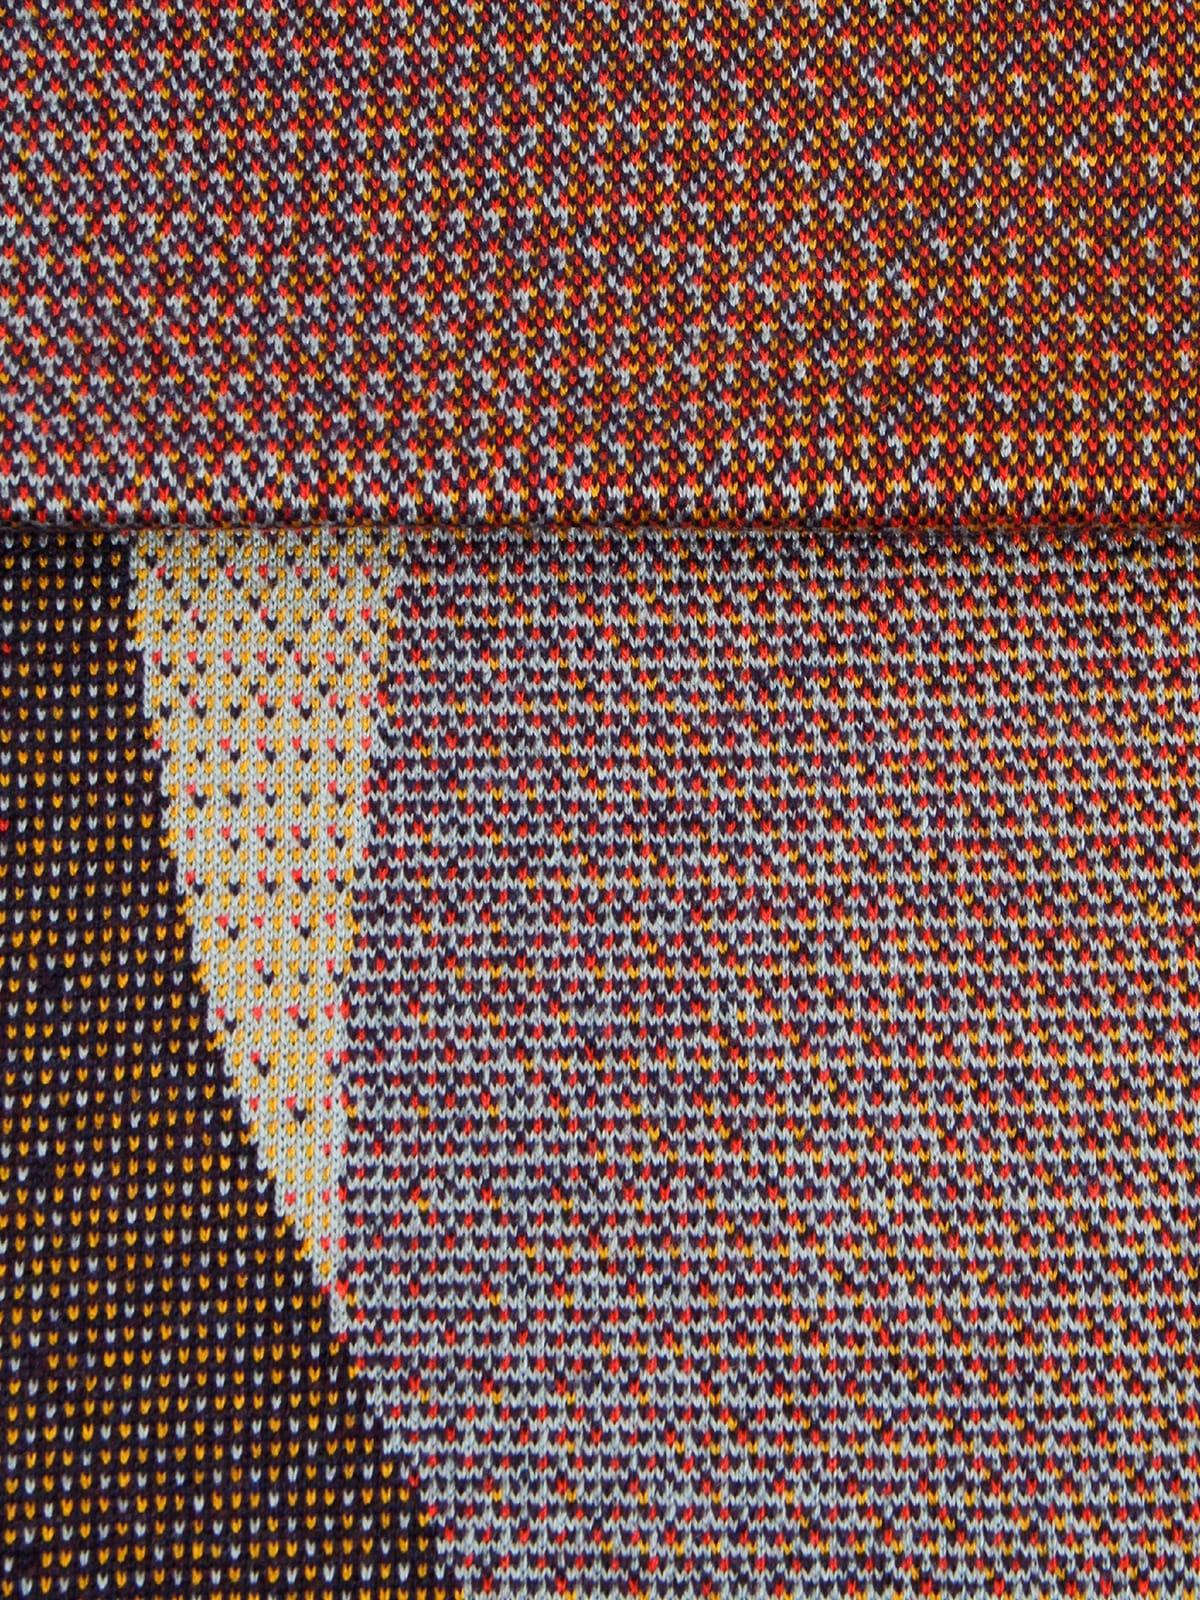 Knitted Blanket Musselshell - Merino Wool details